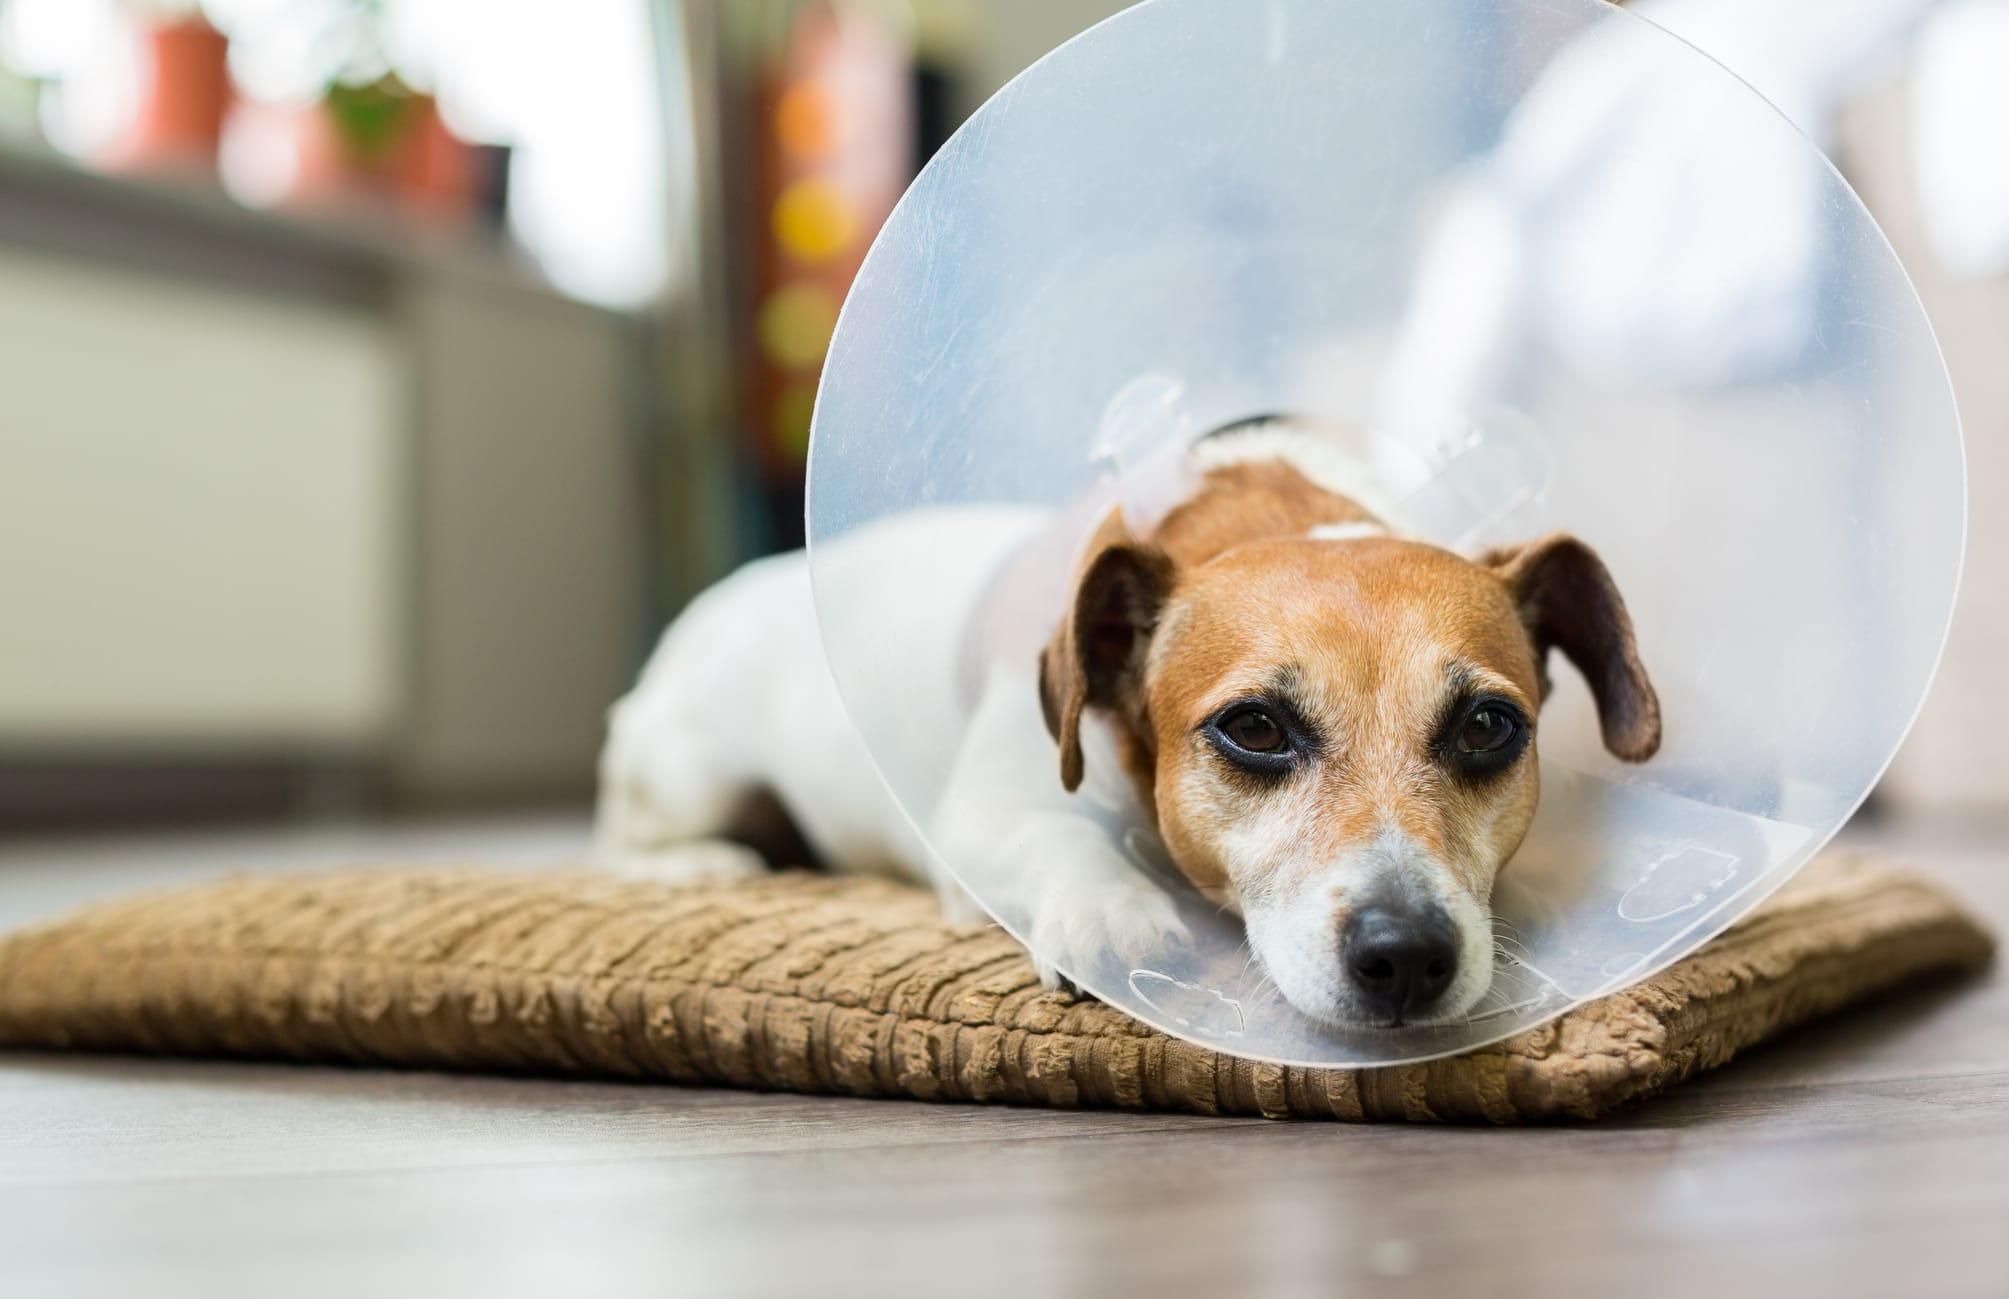 Injured Dog in Cone